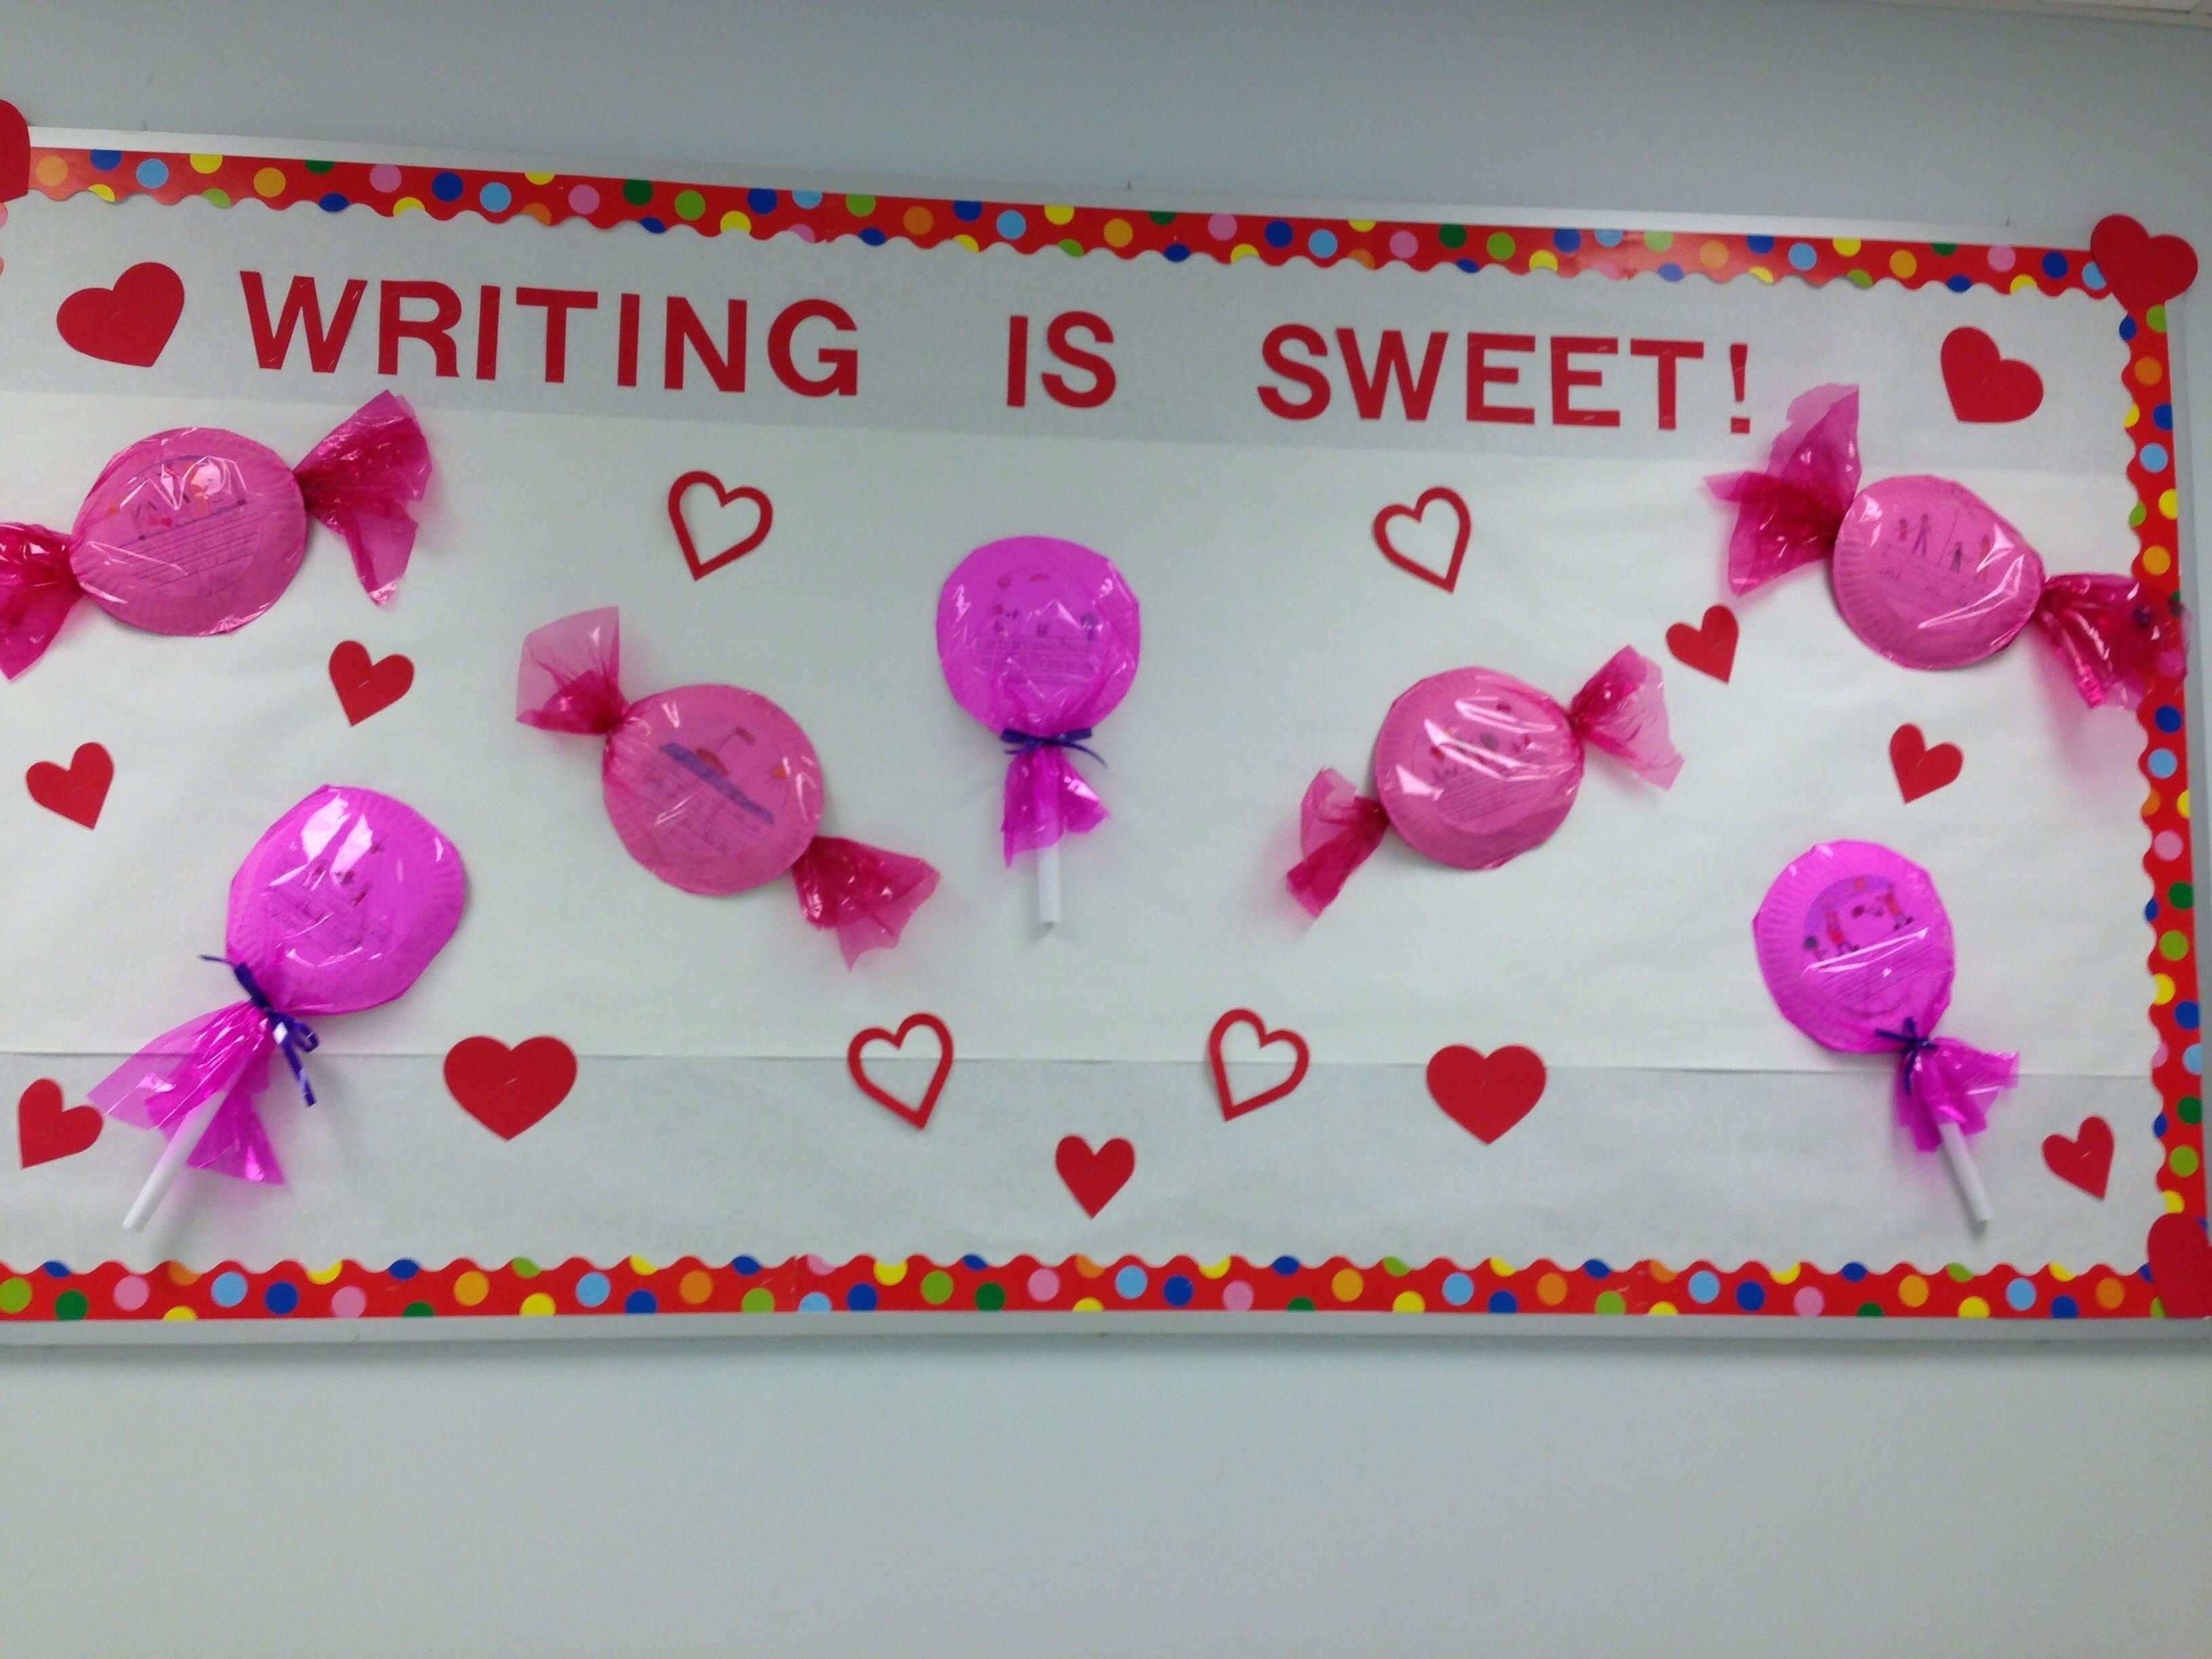 10 Beautiful February Bulletin Board Ideas For Teachers february bulletin board writing is sweet pinterest february 2020